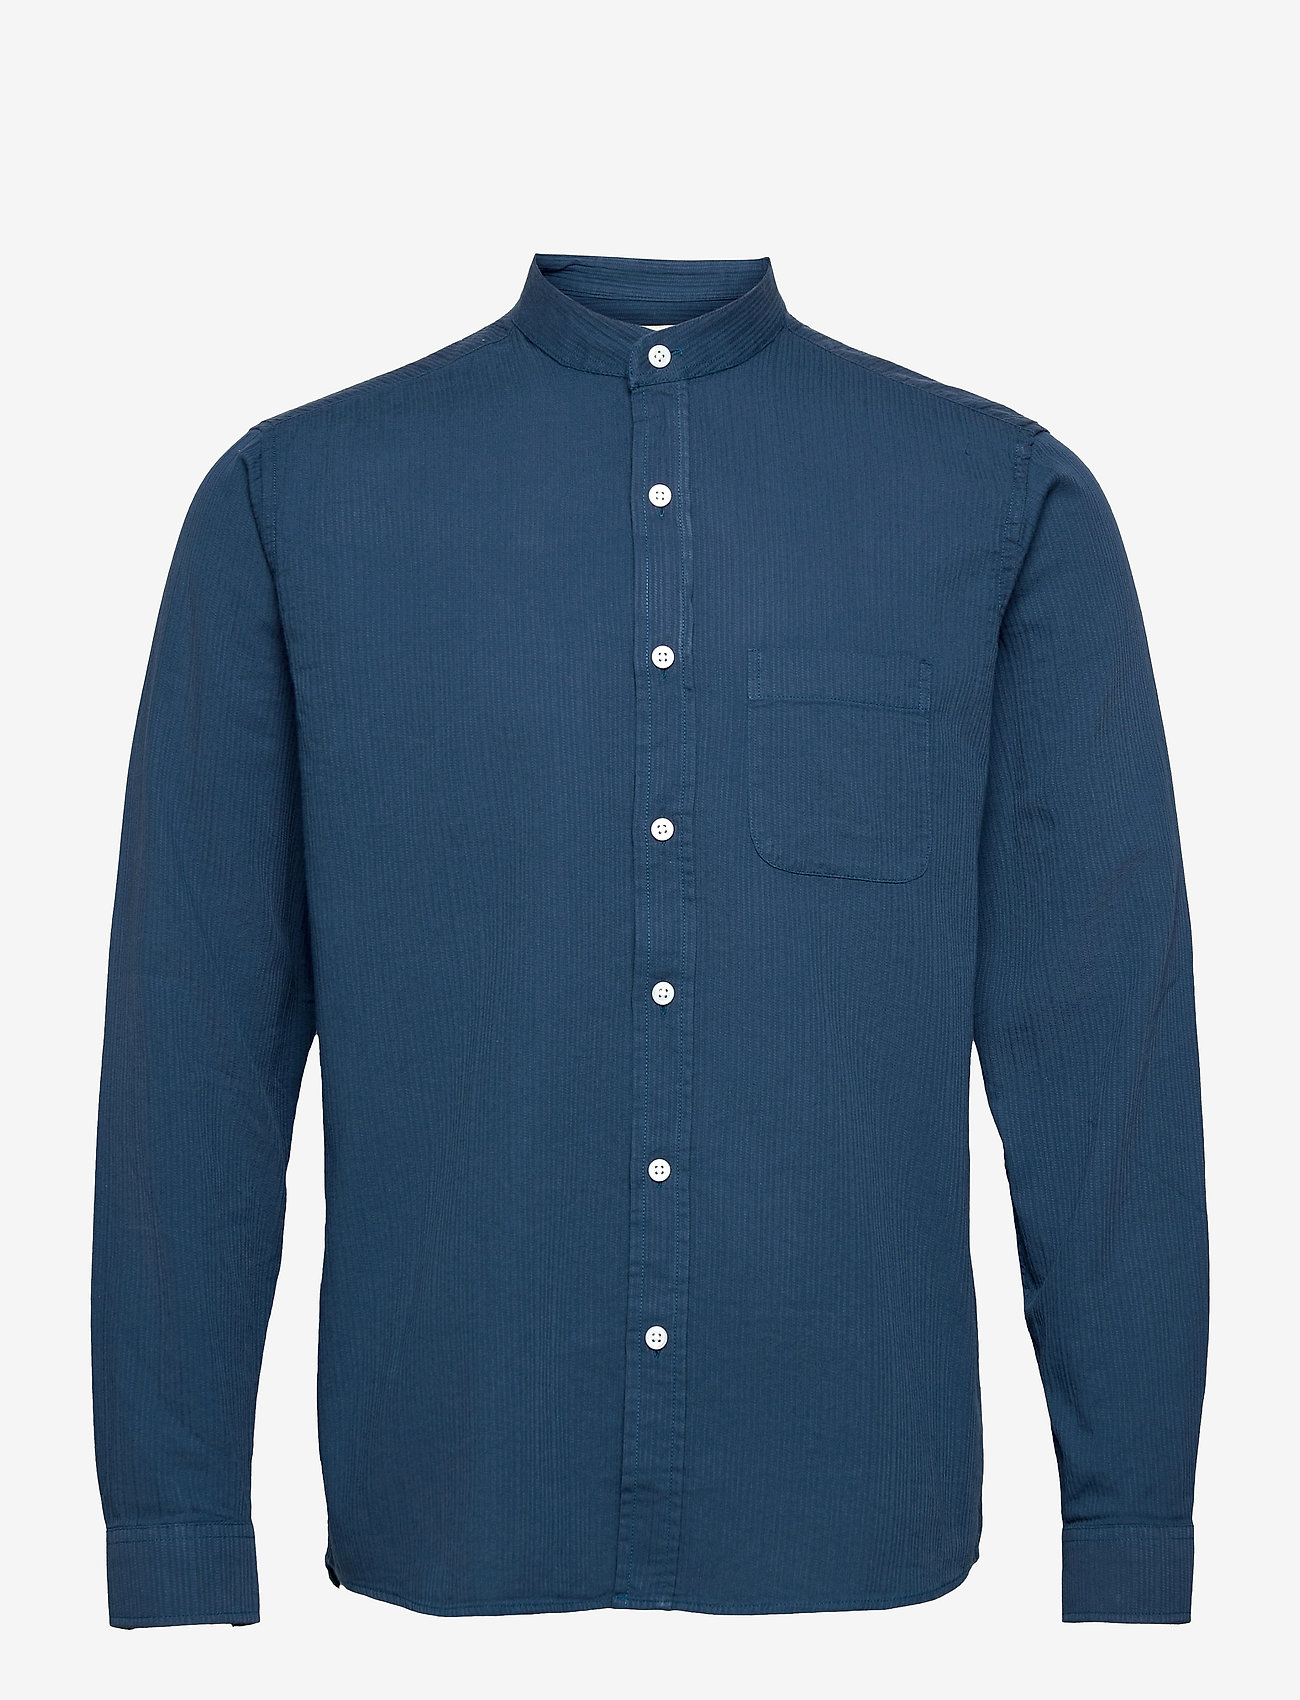 Far Afield - Twombly L/S Shirt - Textured Stripe - linnen overhemden - ensign blue - 0